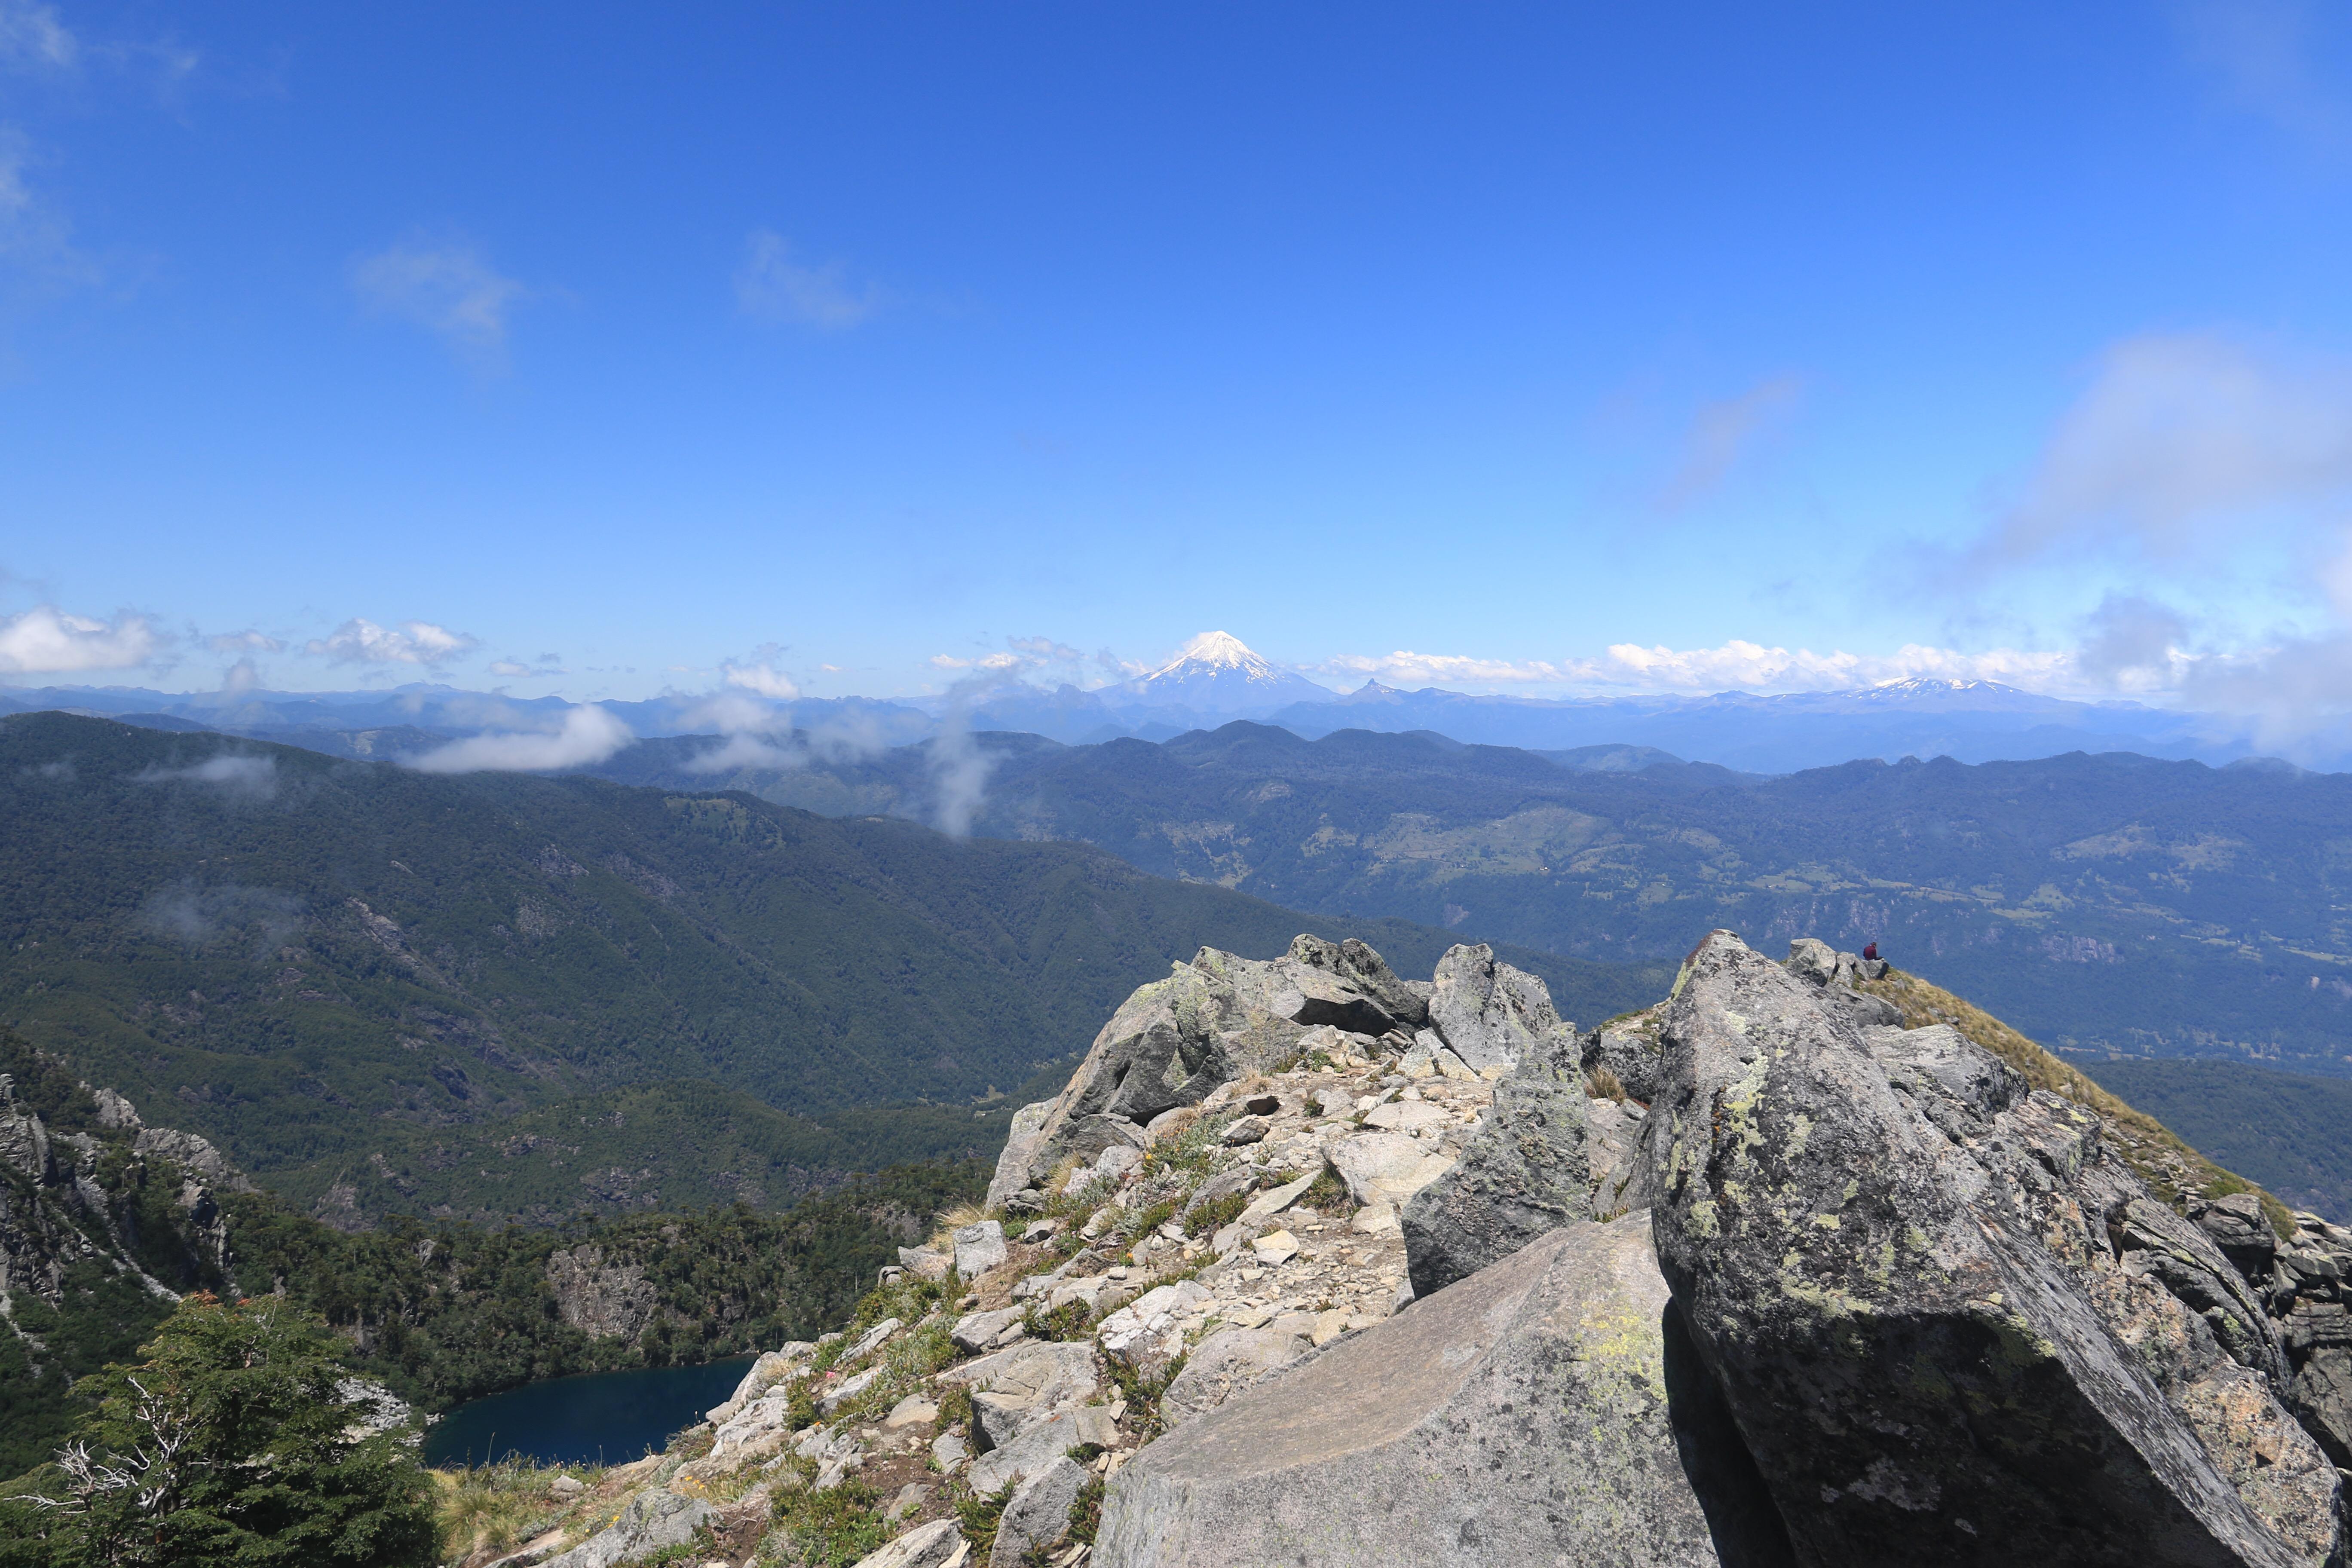 Am Grat des San Sebastian, mit Blick Richtung Villarica